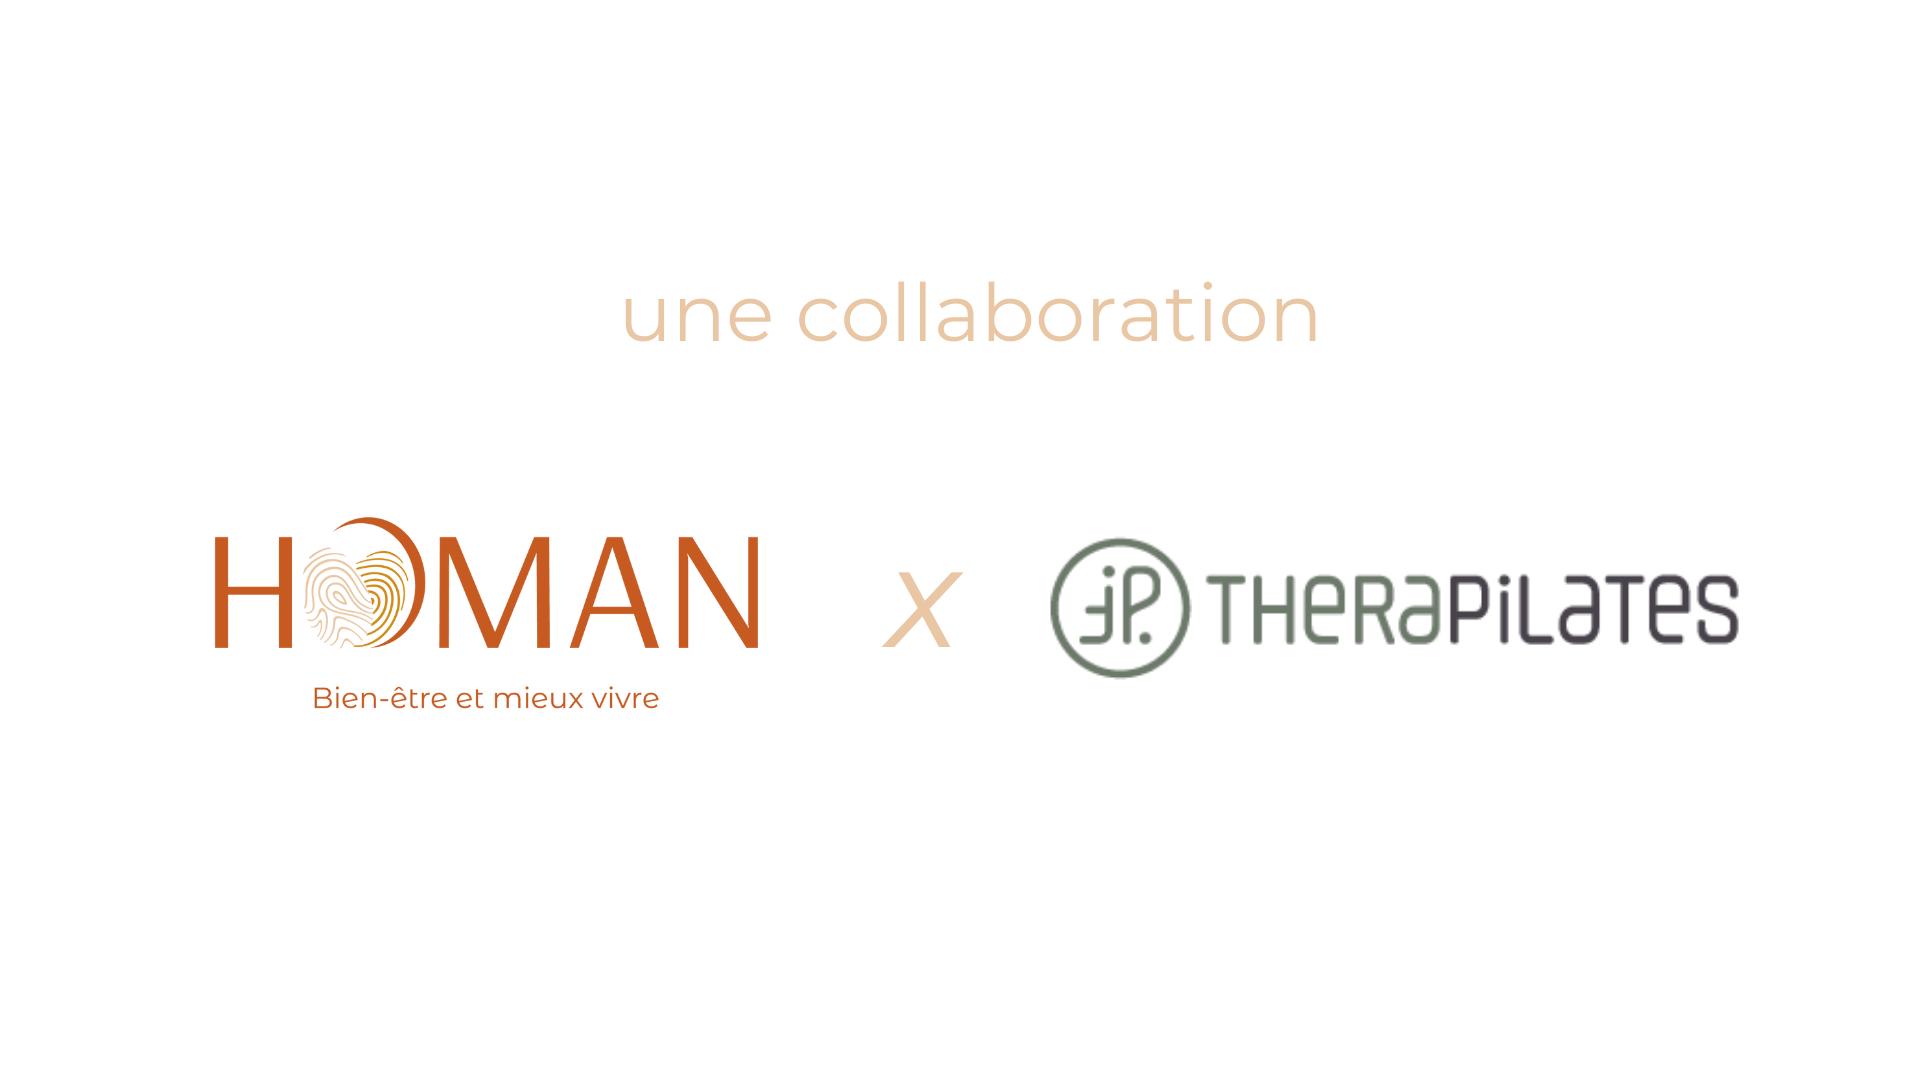 Collaboration Homan x Therapilates